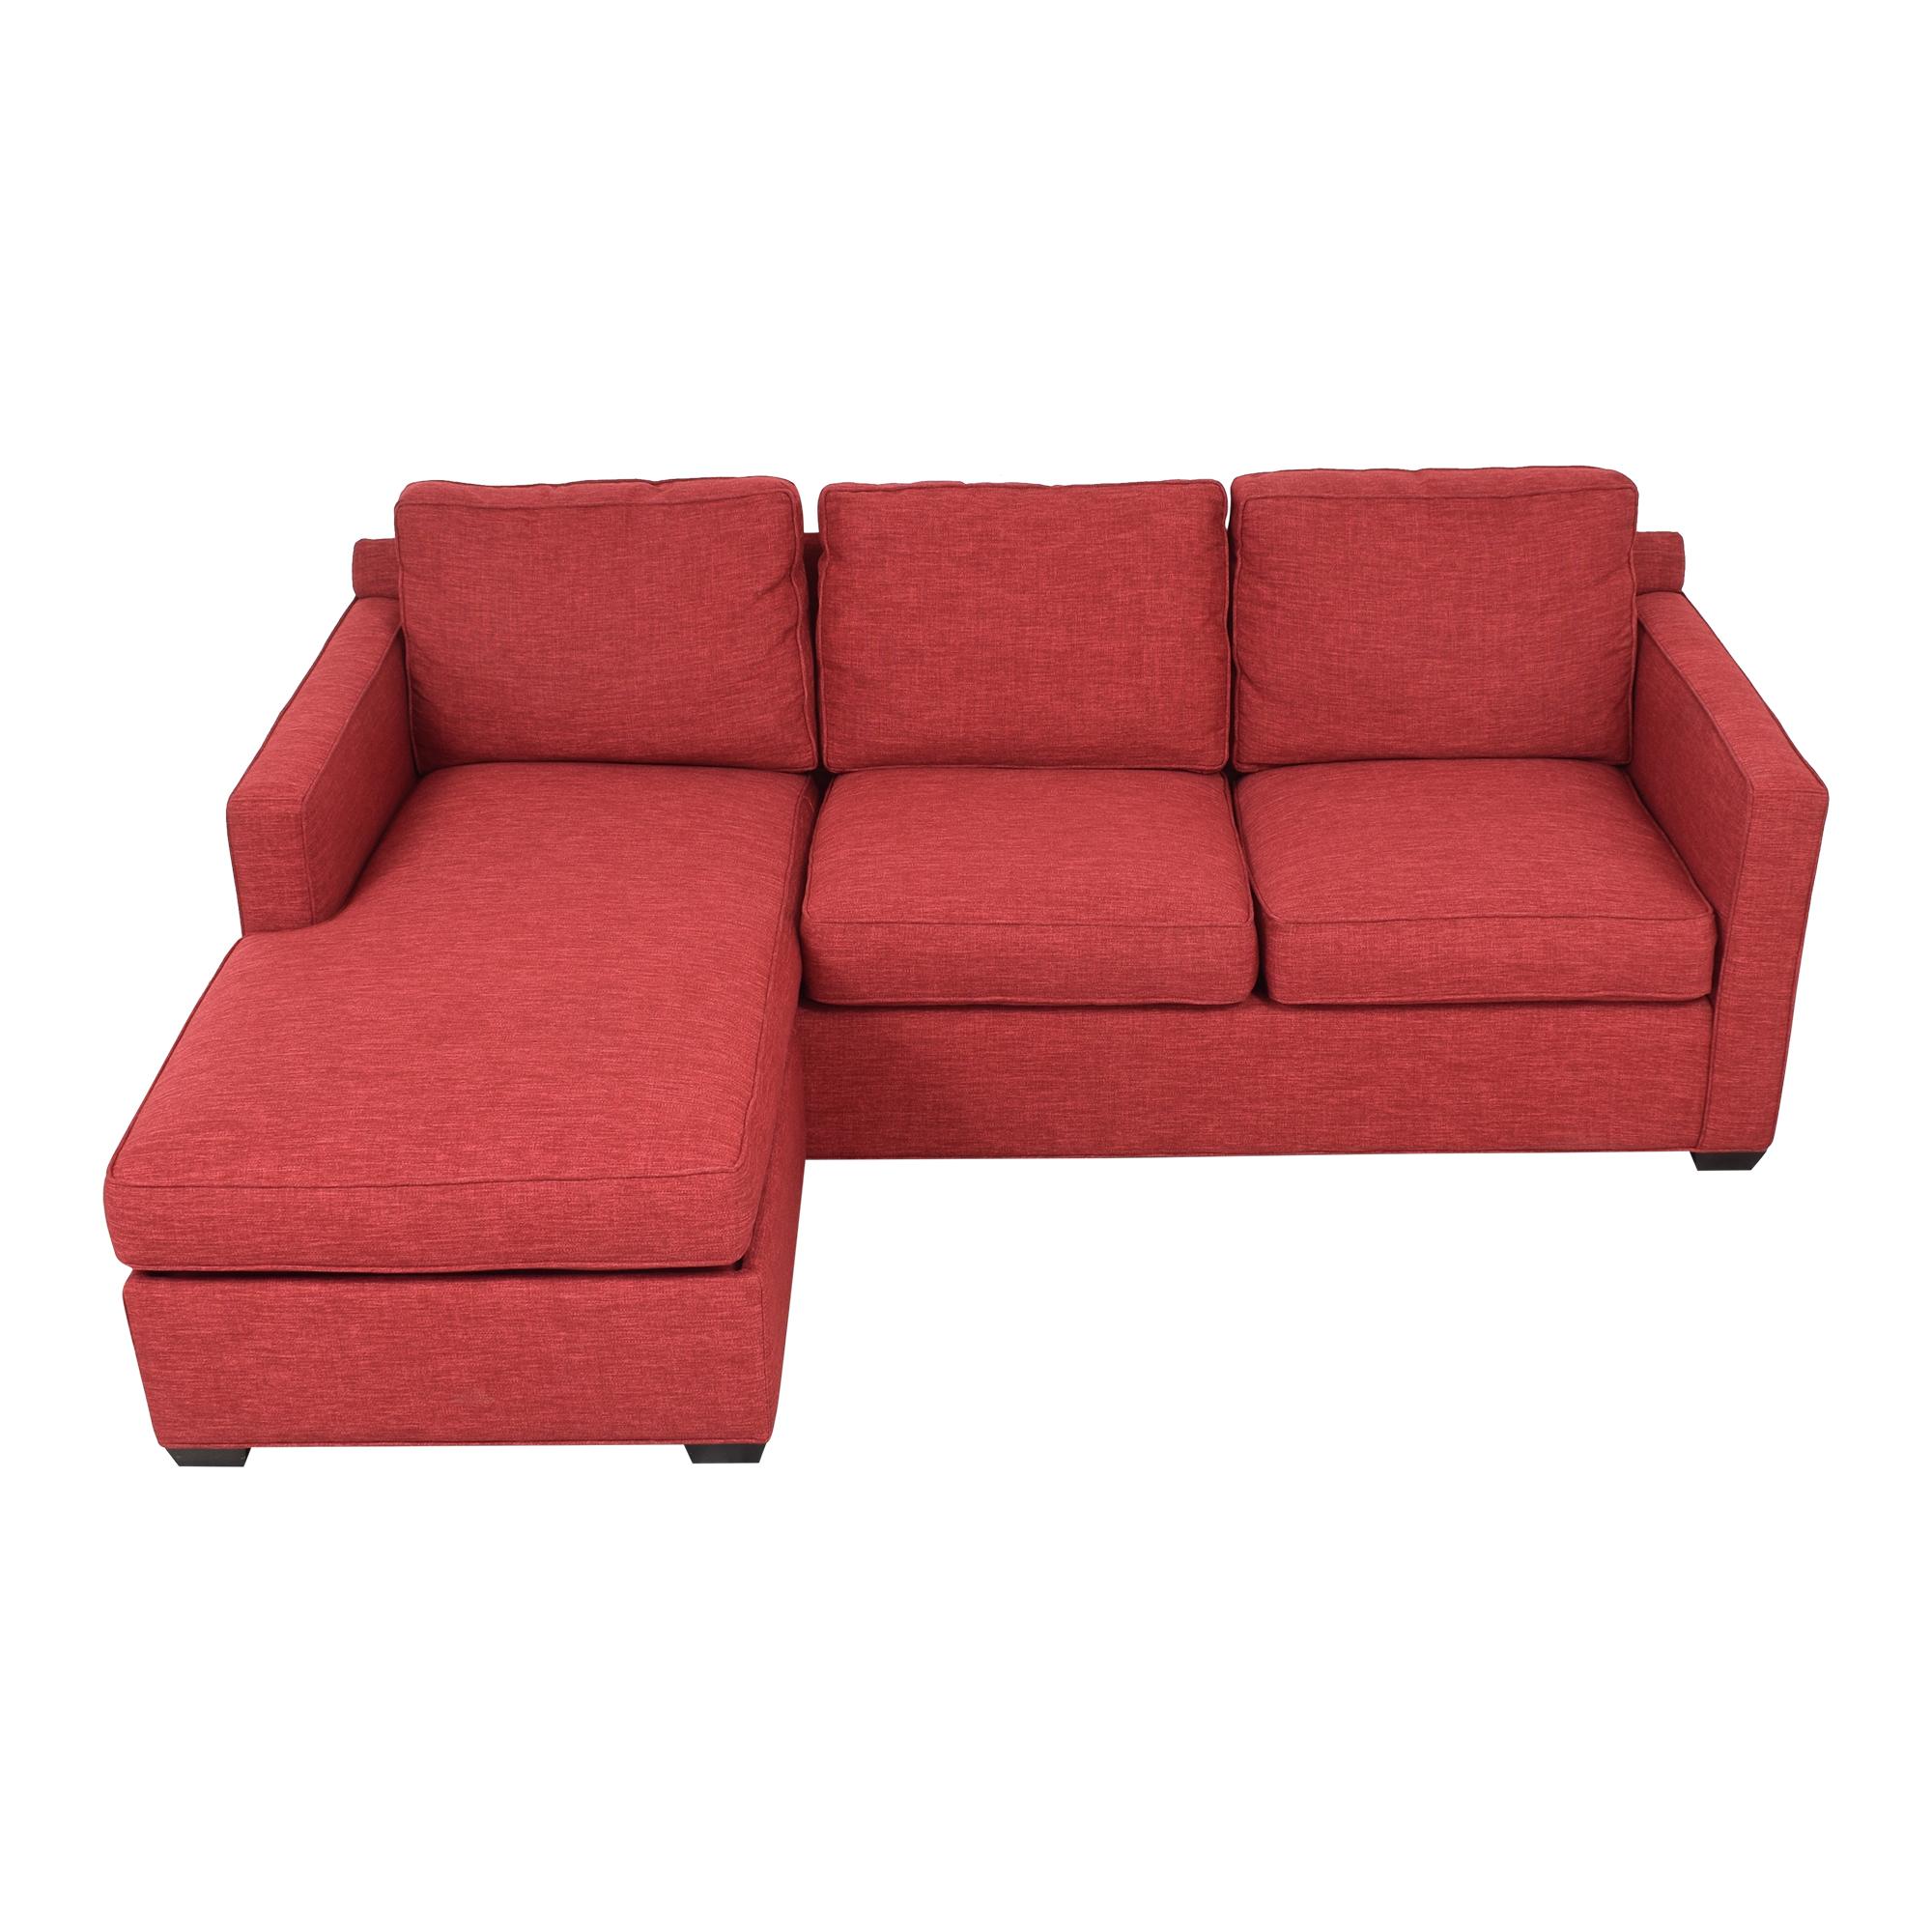 Crate & Barrel Crate & Barrel Davis 3-Seat Lounger Sofa Sectionals